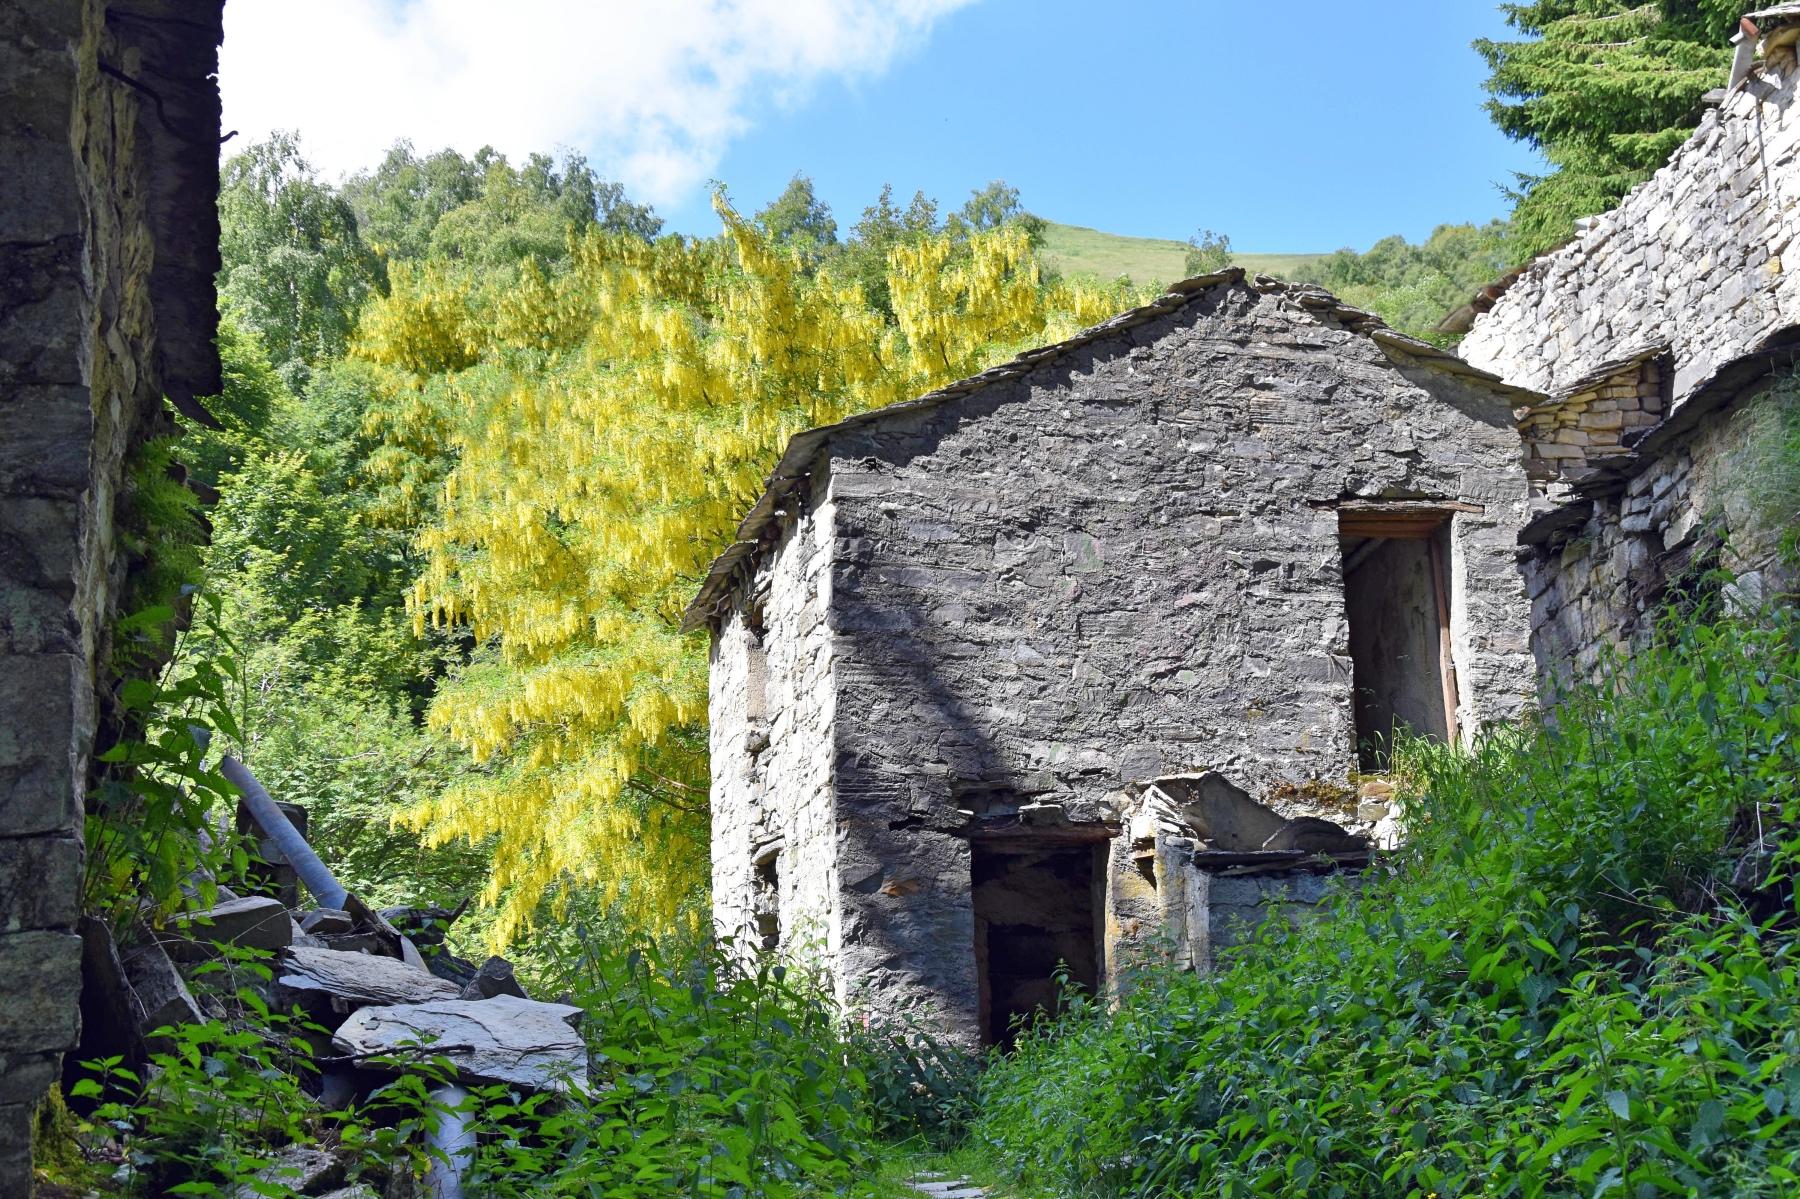 Stone houses along the Sentiero basso. Image by Luigia Carloni